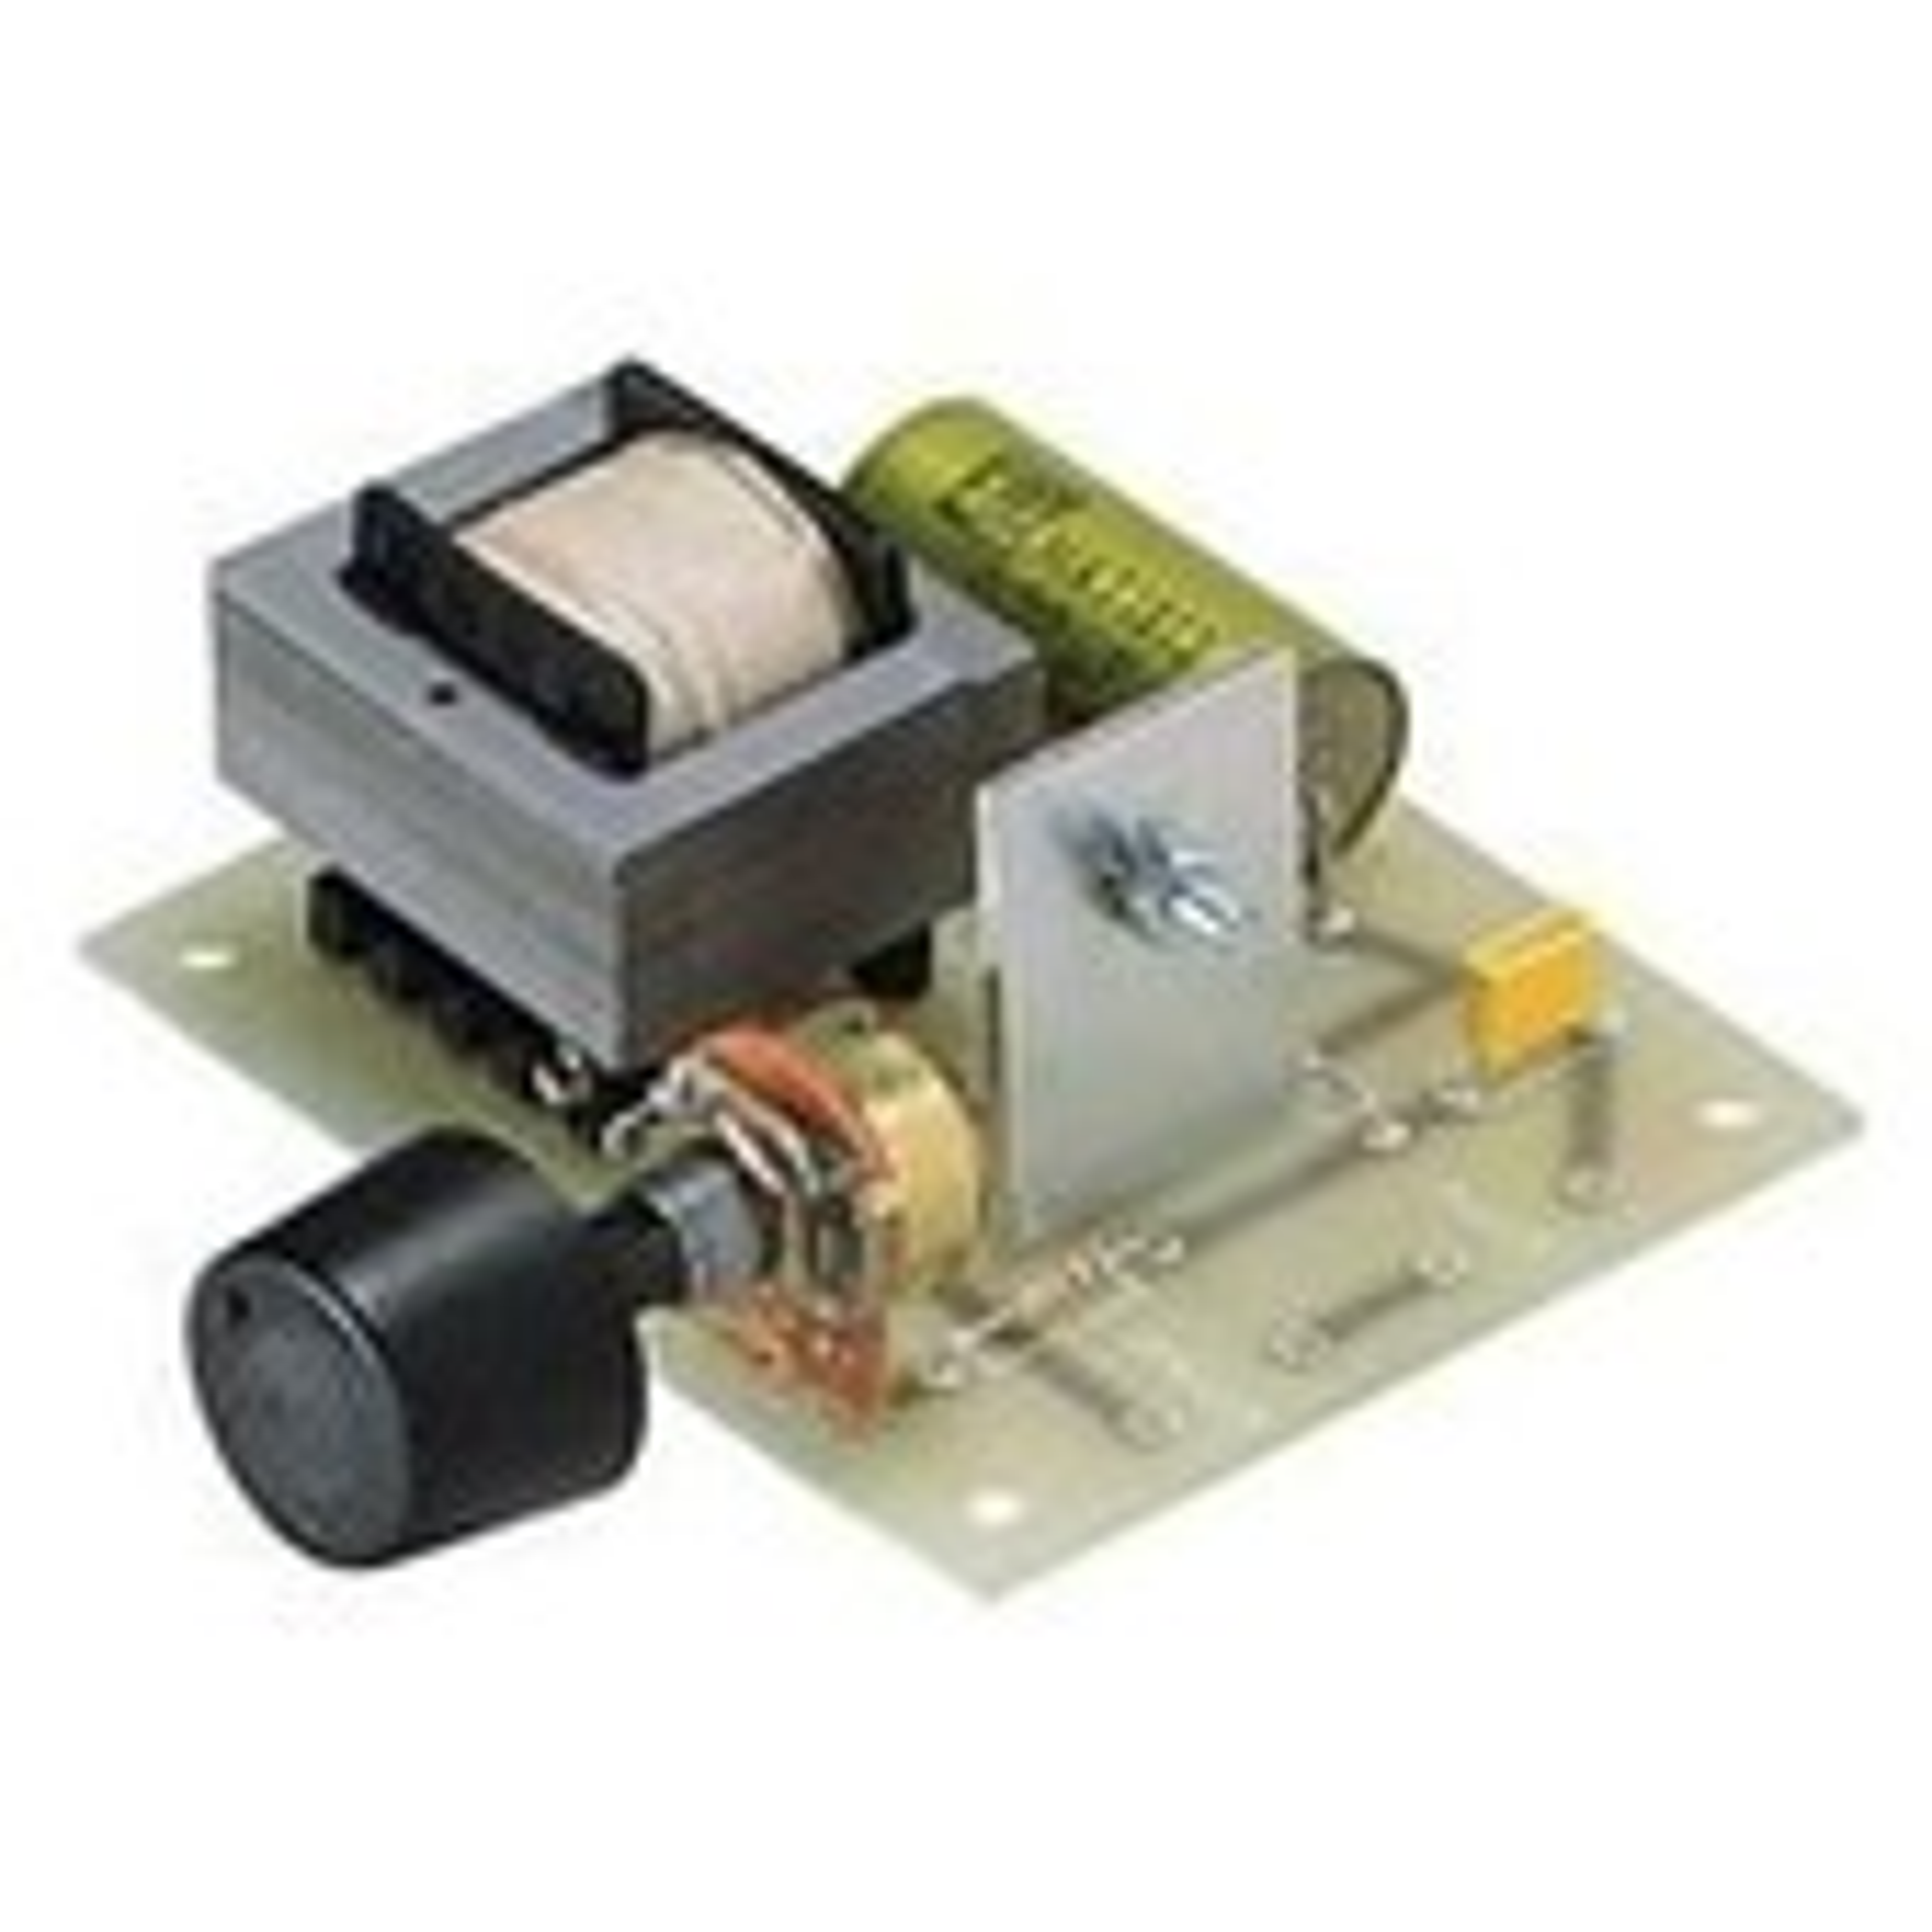 Kit Electronique Variateur De Vitesse 220v Ref Pl 75